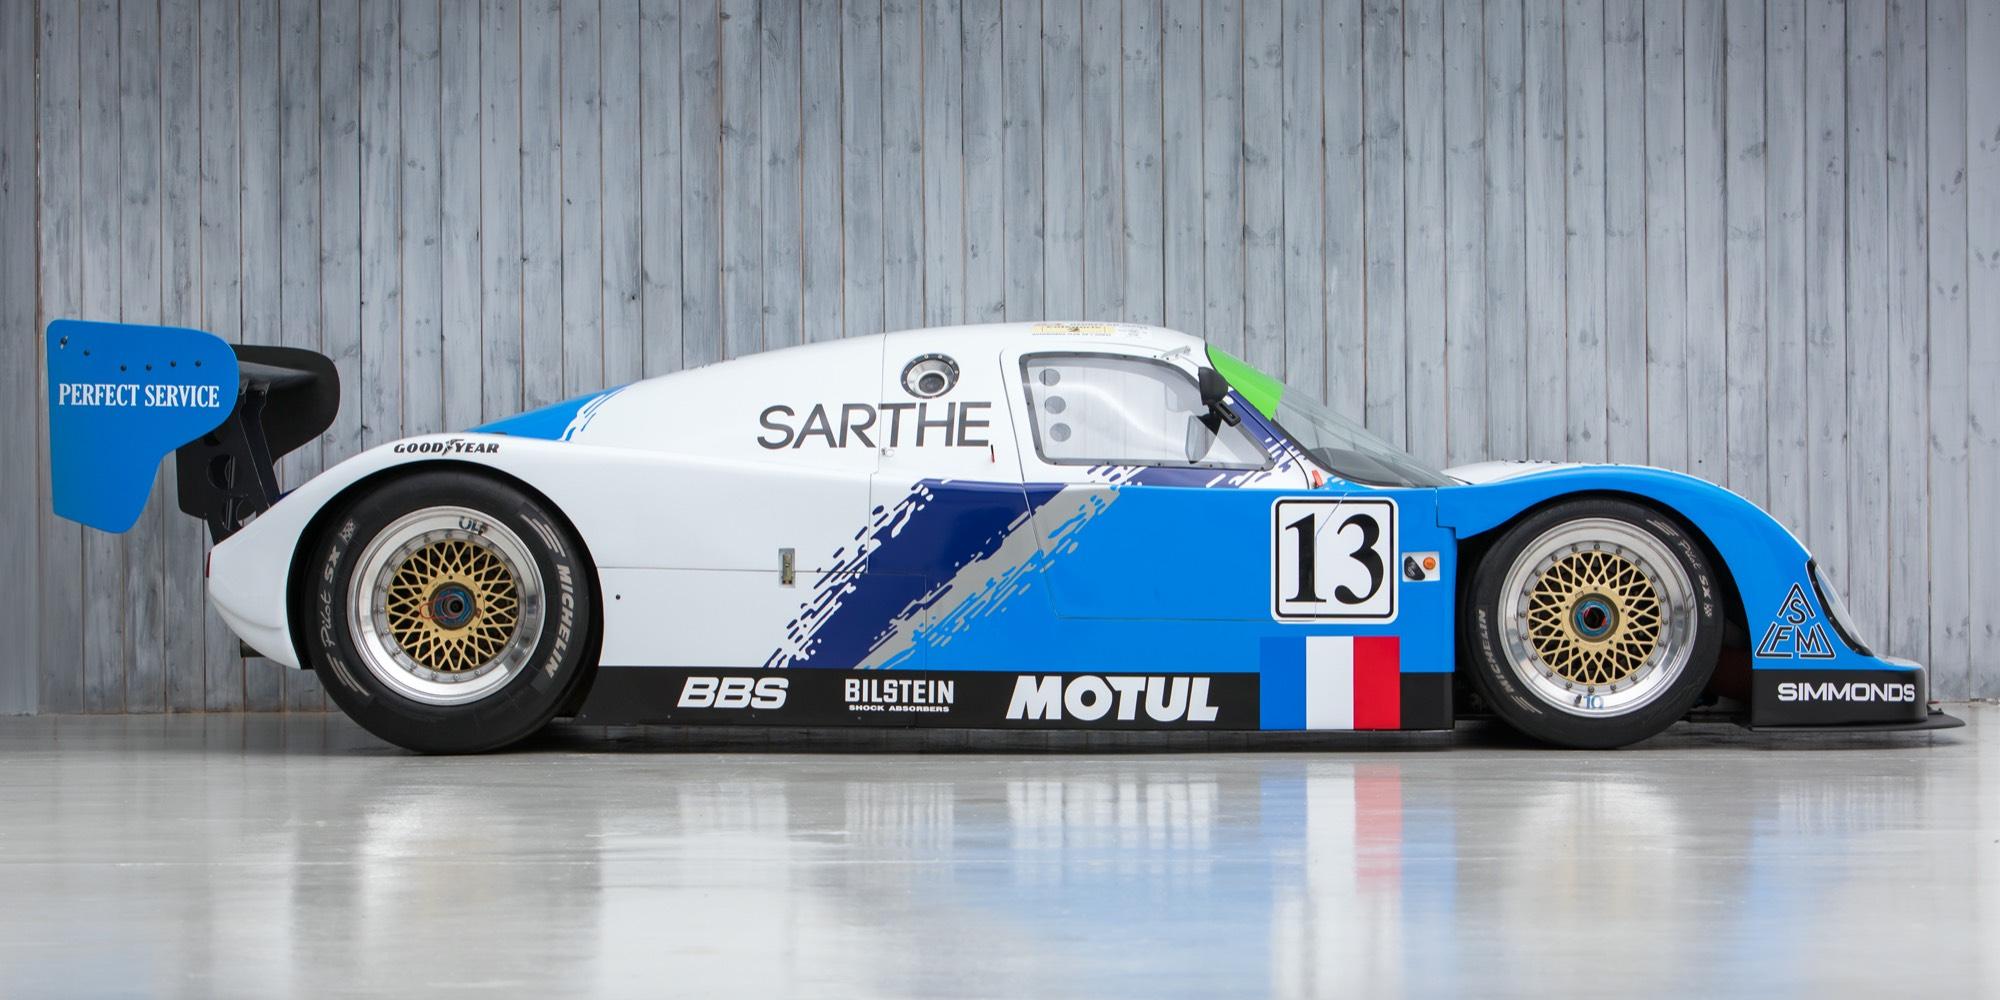 The Ex – Mario & Michael Andretti, Jan Lammers, Derek Warwick, Multiple Le Mans 24 Hours 1993 Courage – Porsche C30 LM Group C